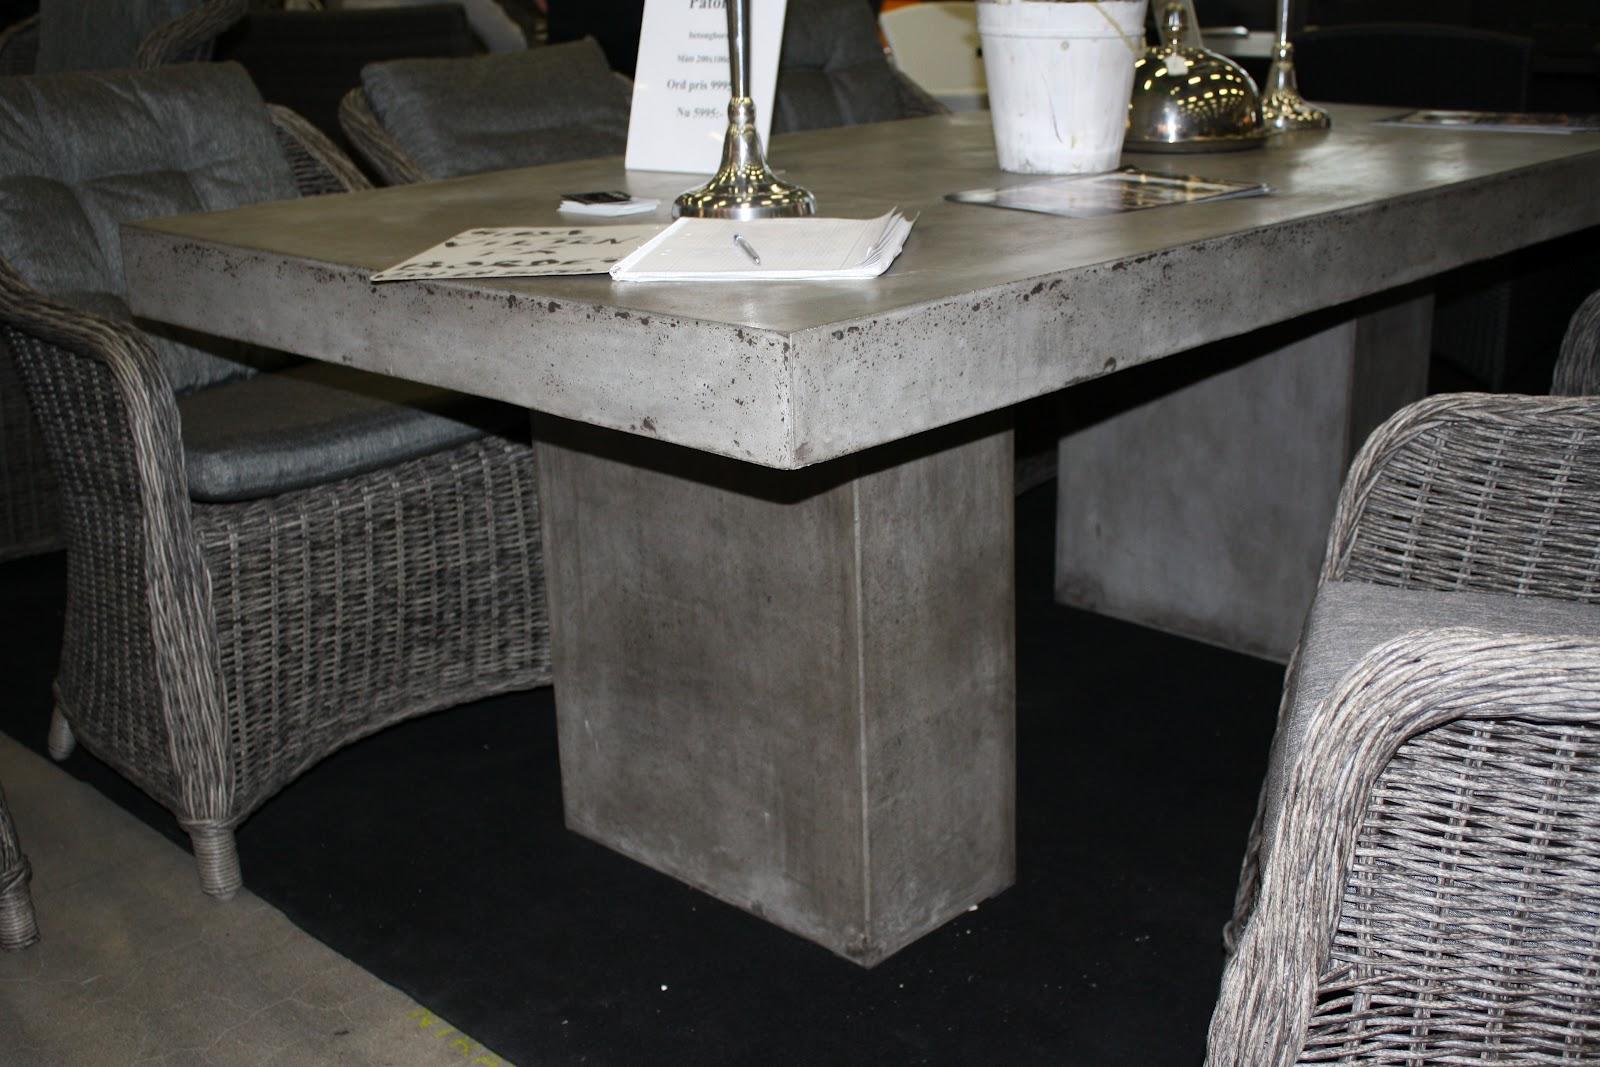 gjuta eget betongbord